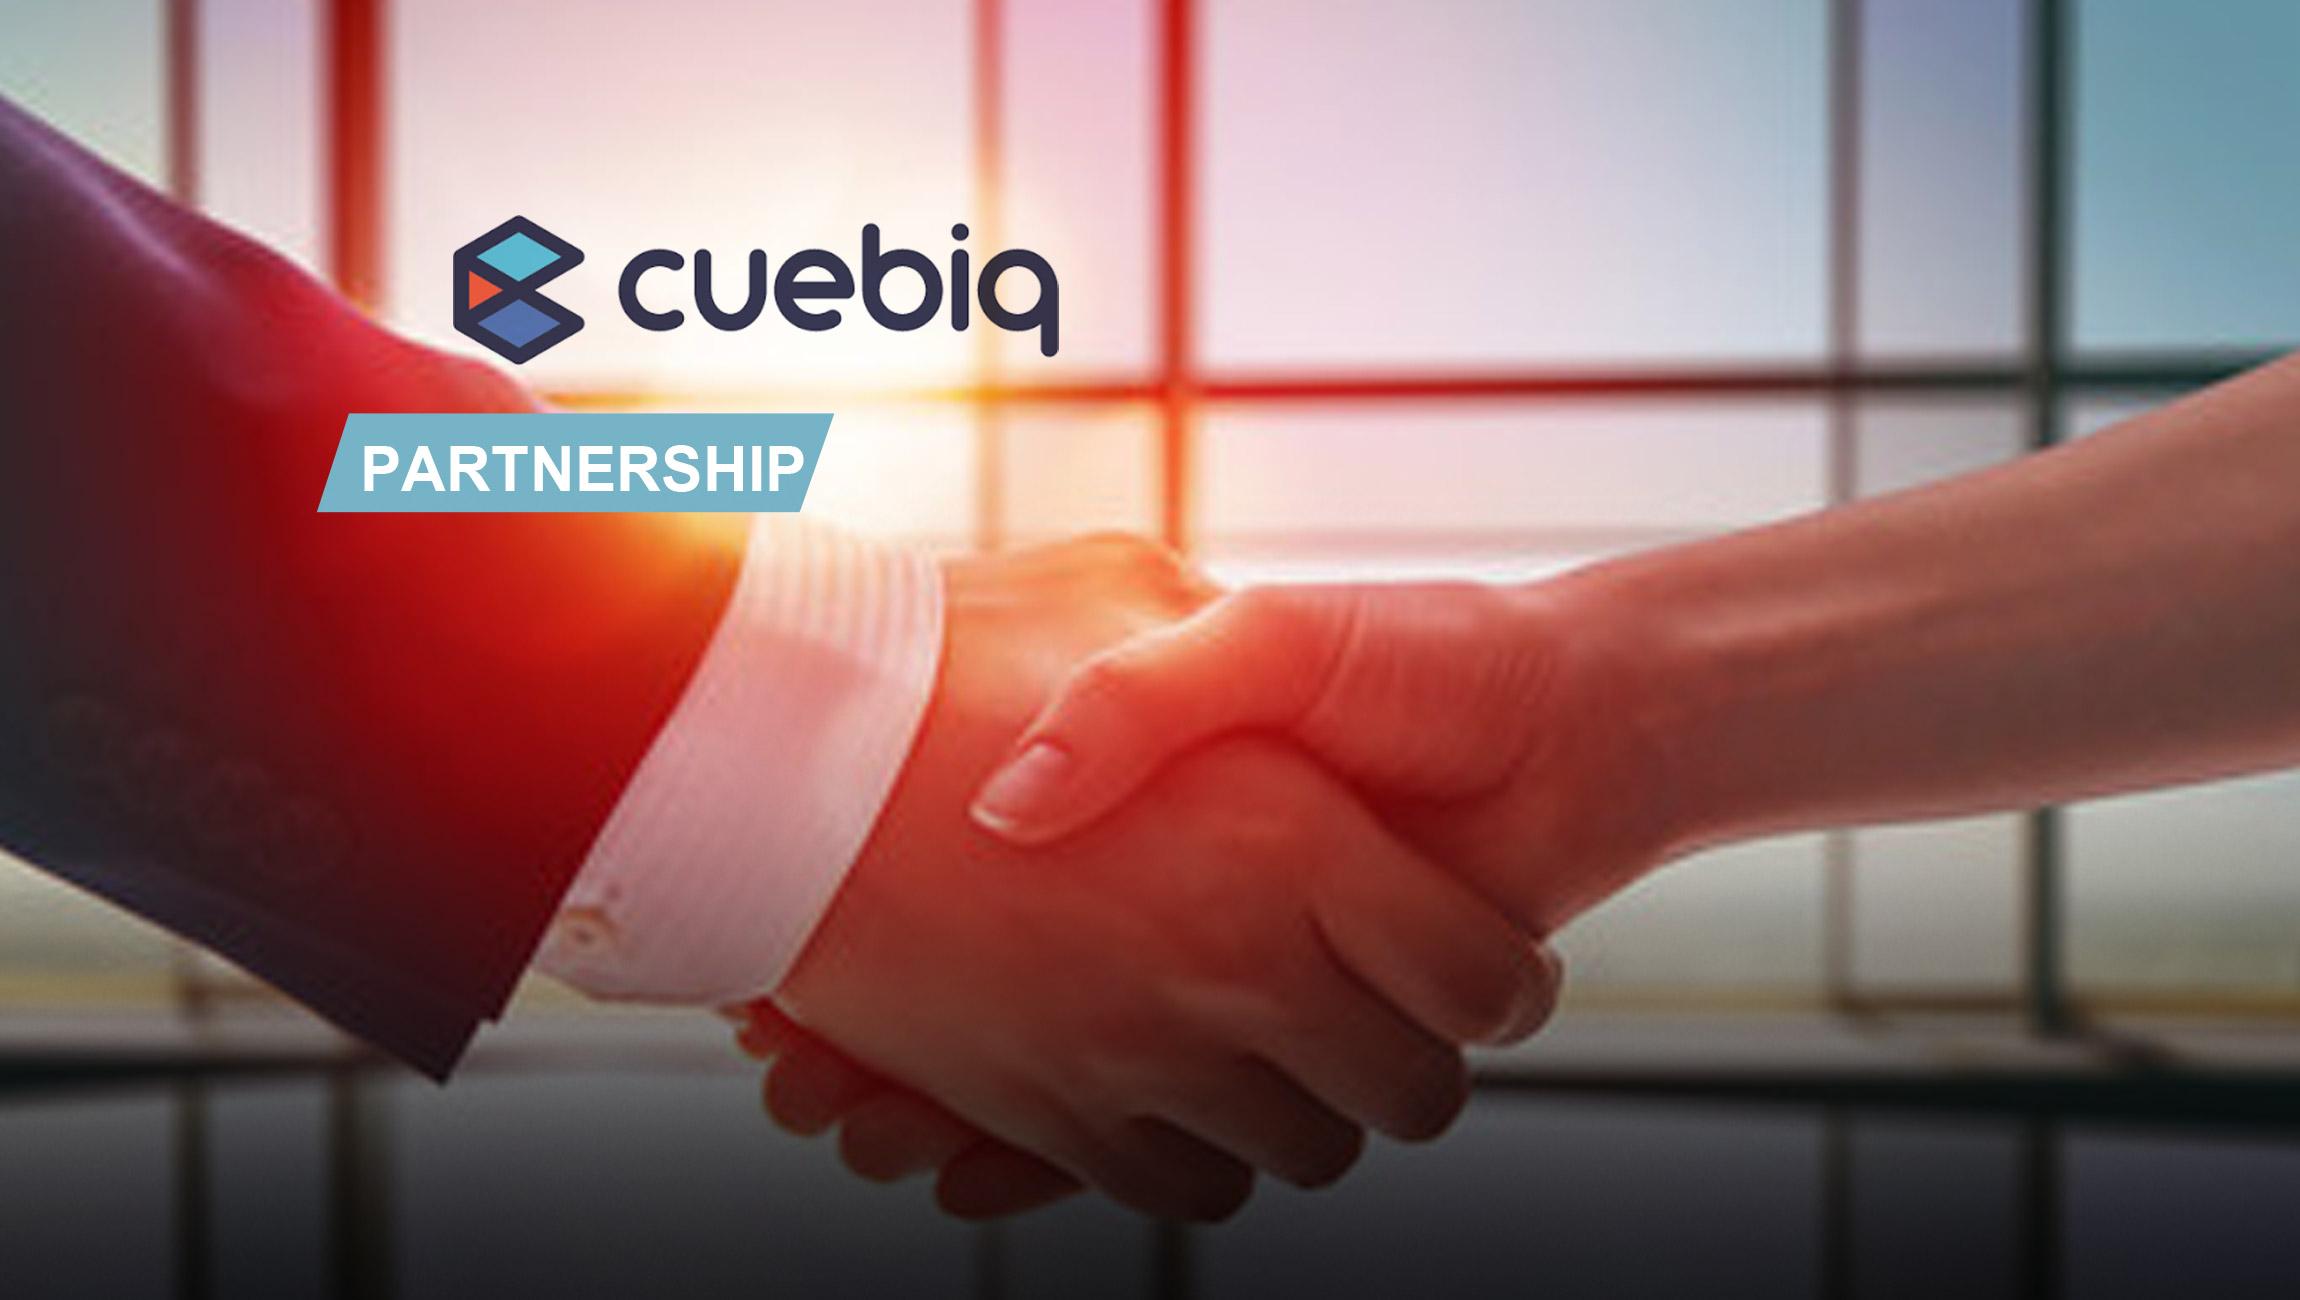 Astraea Announces Partnership With Cuebiq 1